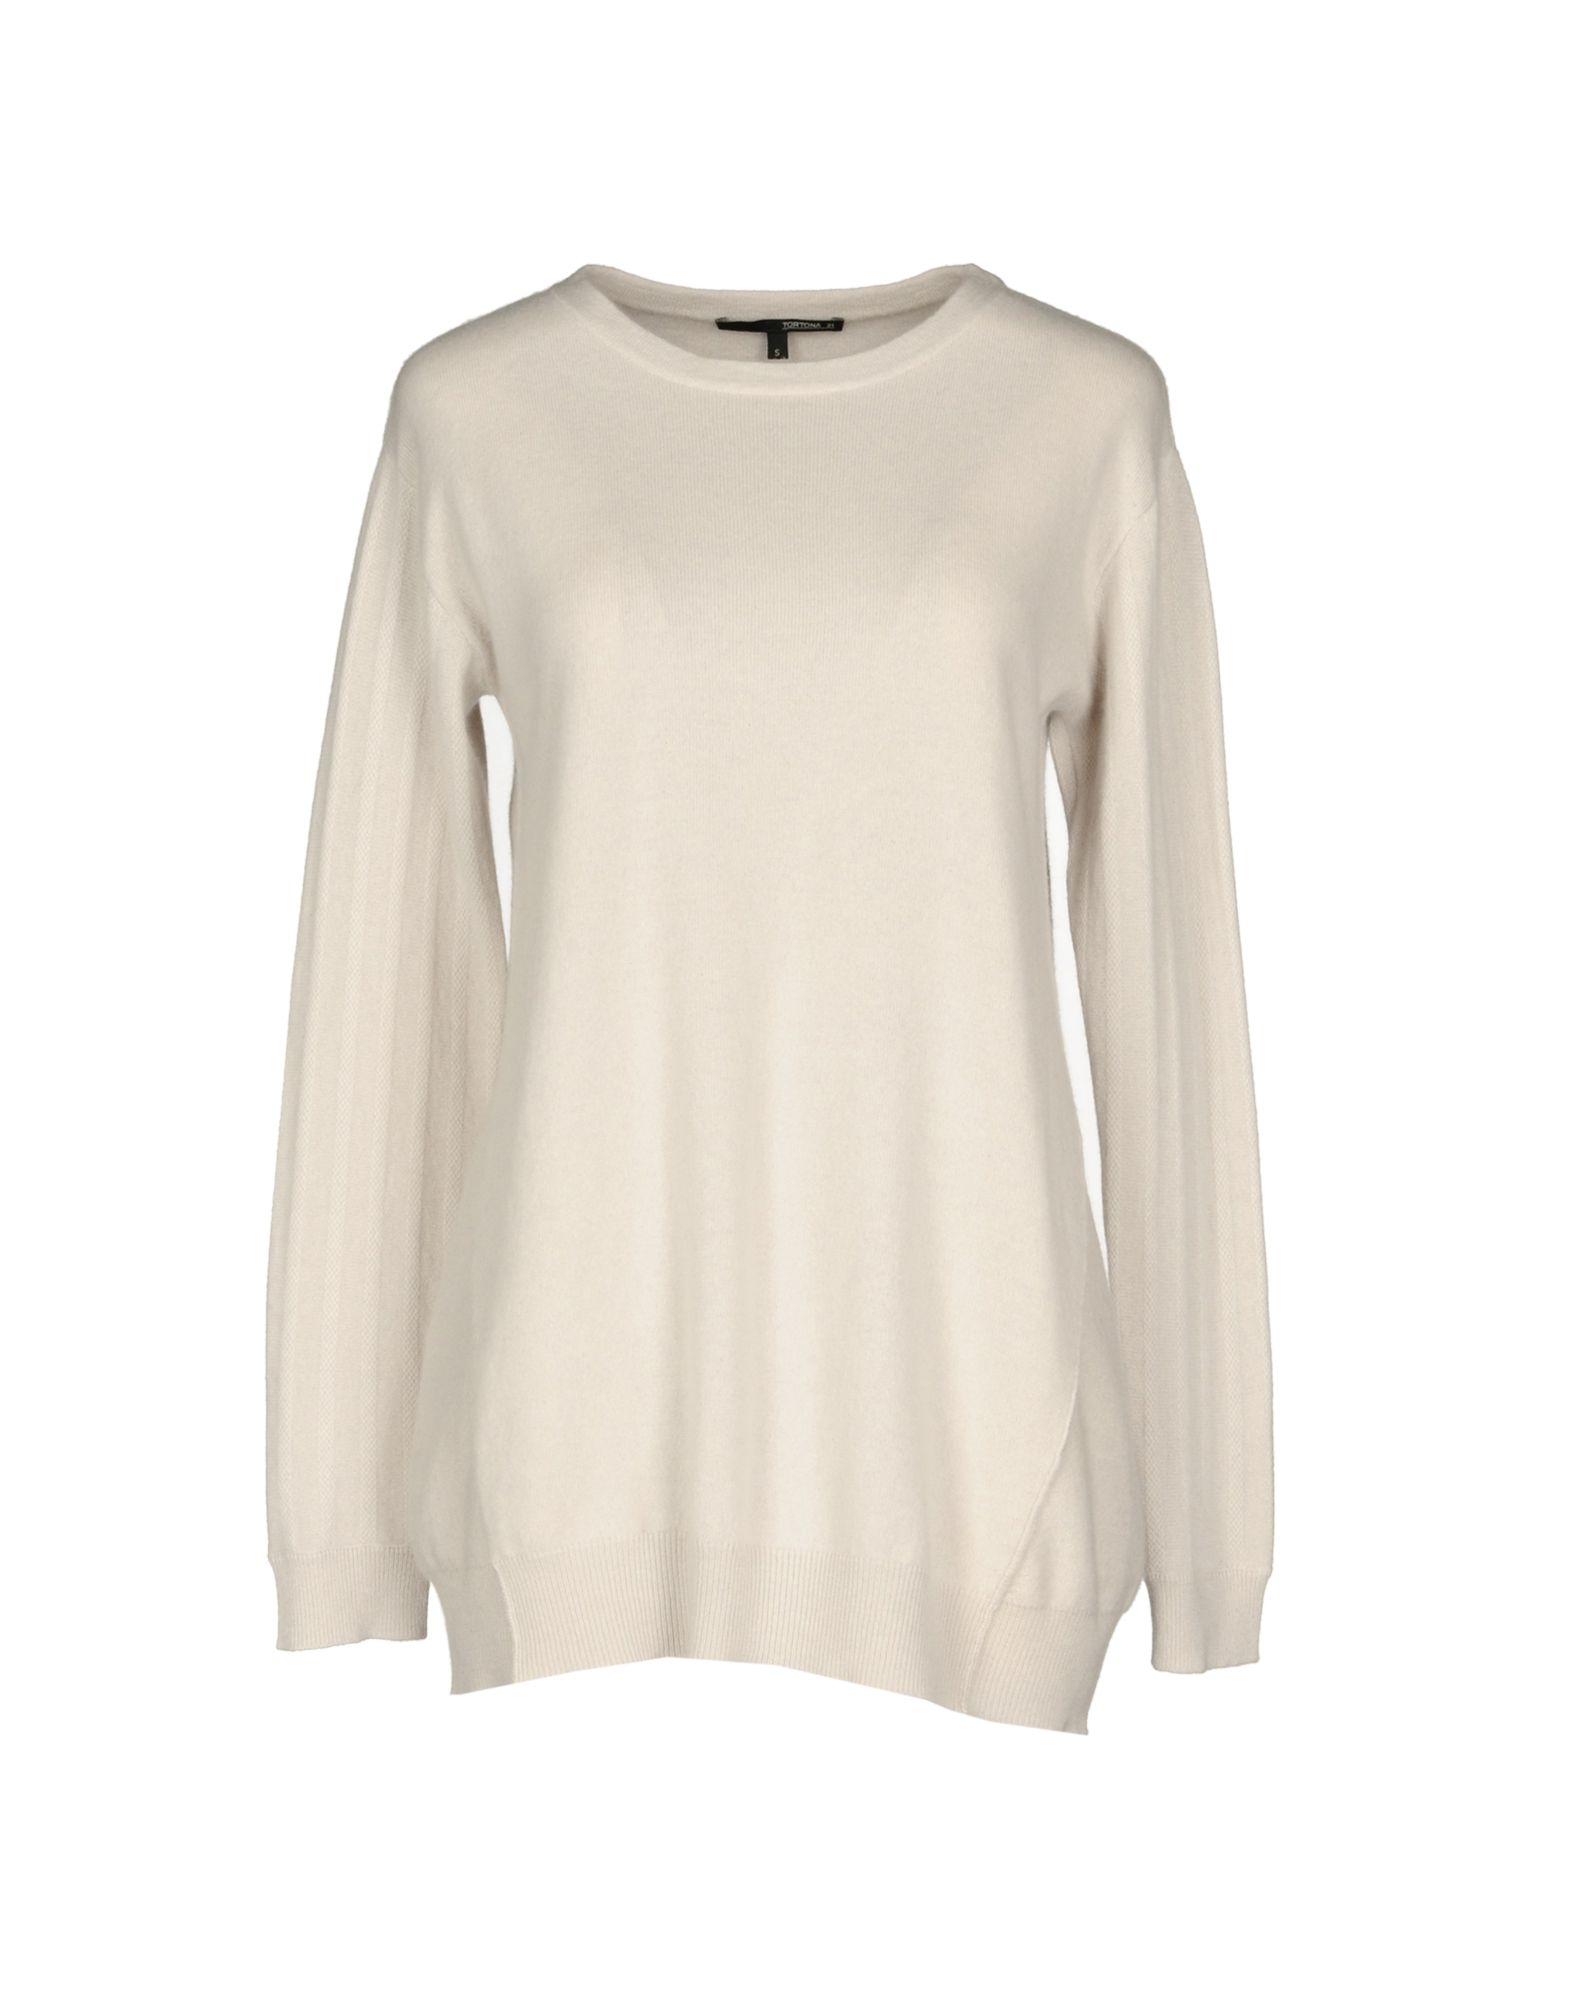 TORTONA 21 Damen Pullover Farbe Hellgrau Größe 5 jetztbilligerkaufen